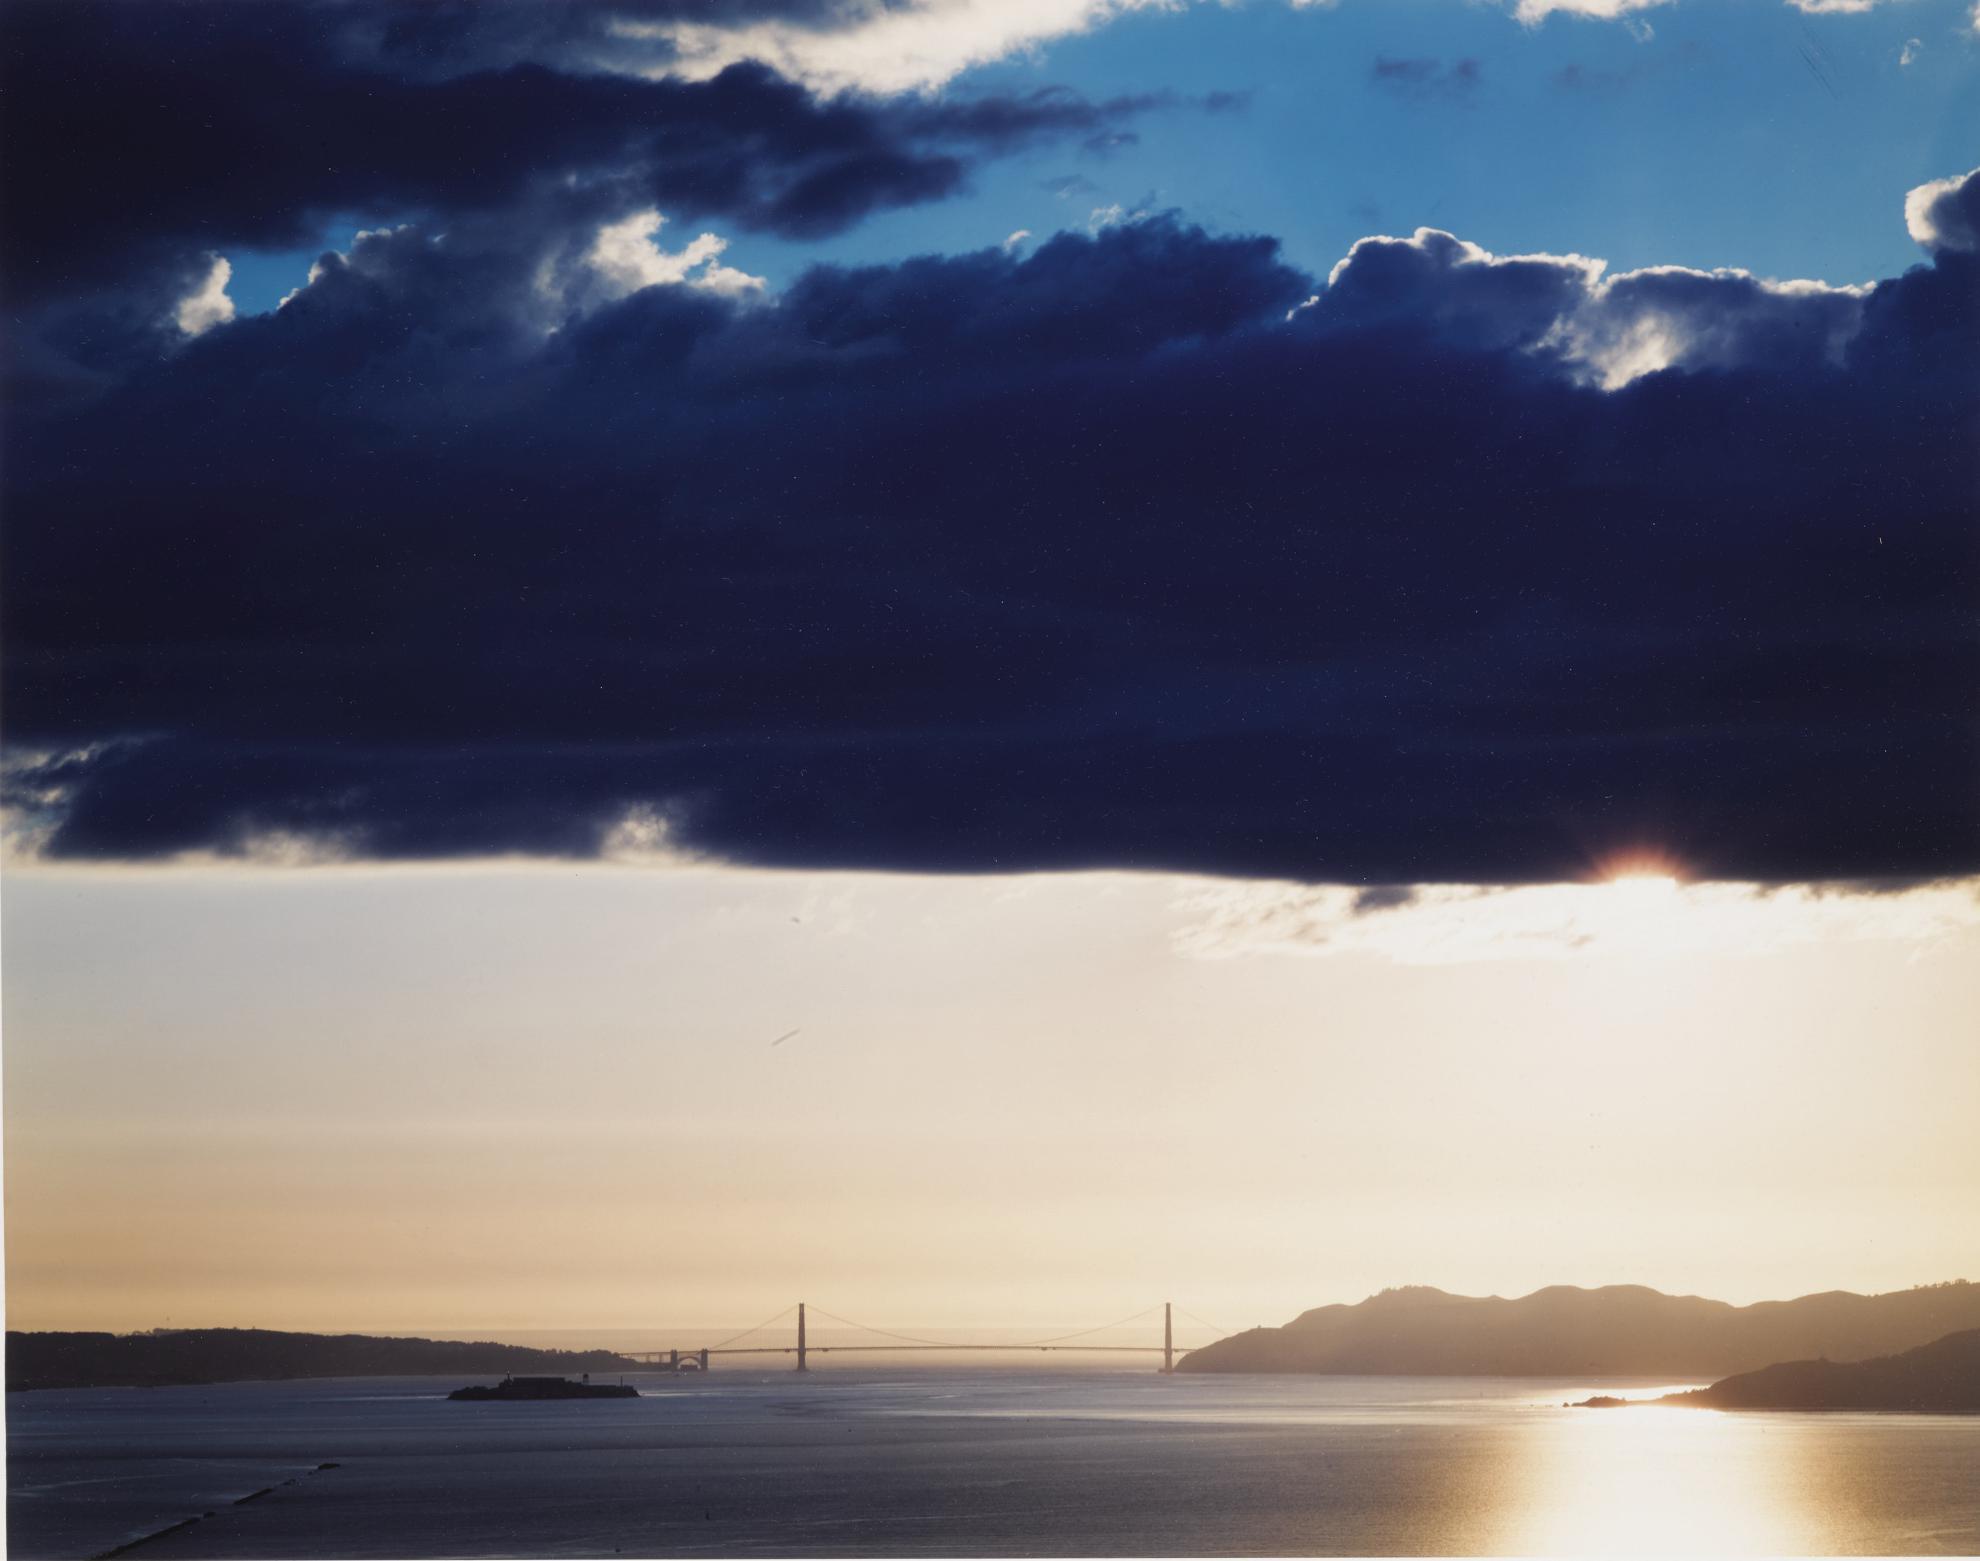 Richard Misrach-Golden Gate Bridge 2.21.00, 5:32 Pm-2000